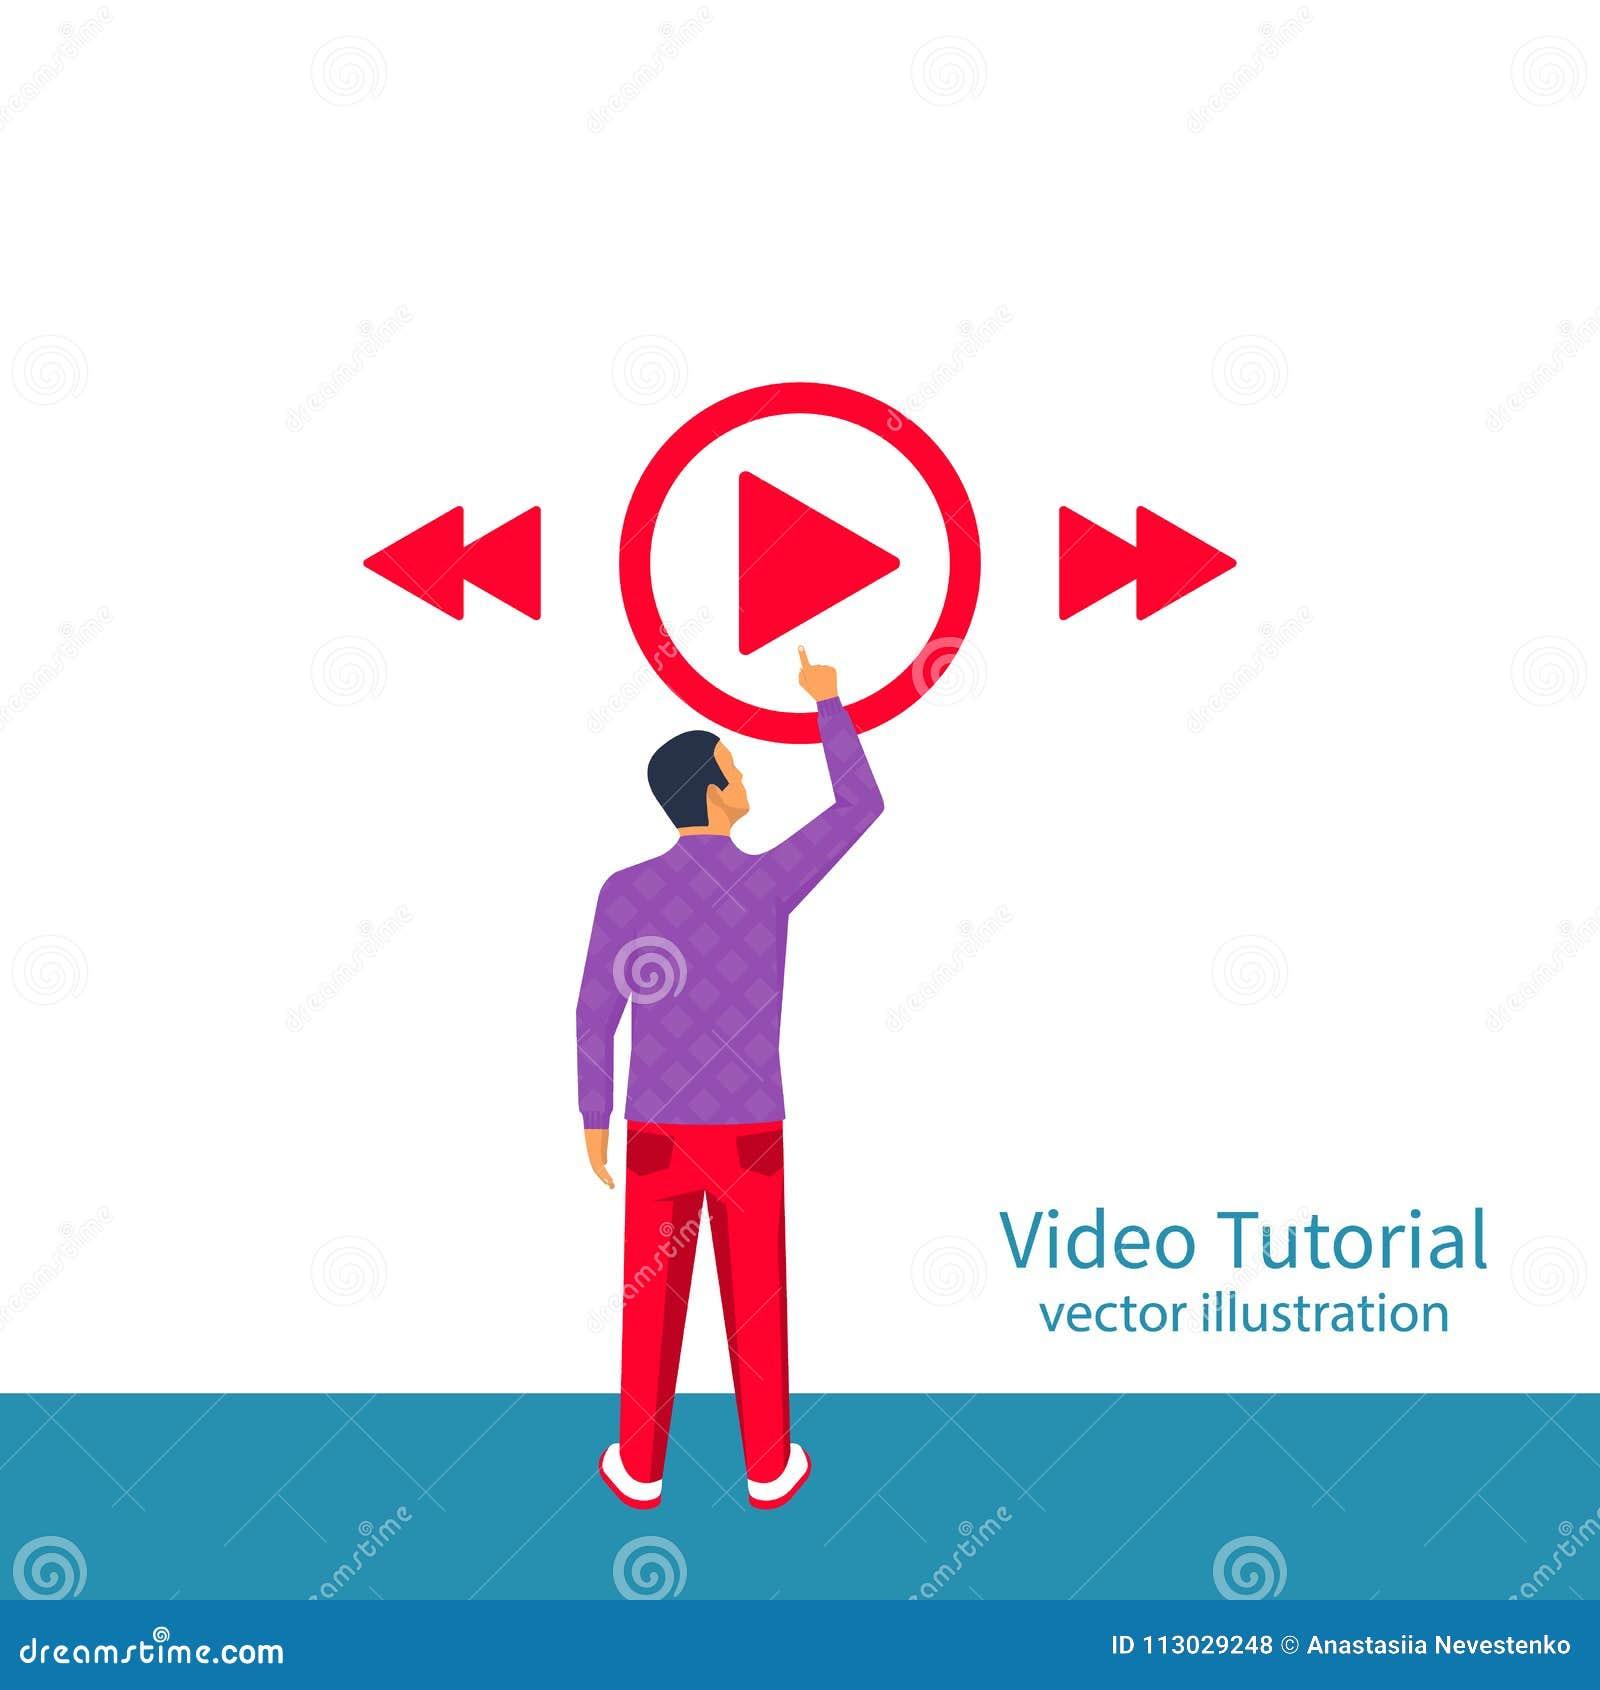 Icono preceptoral video